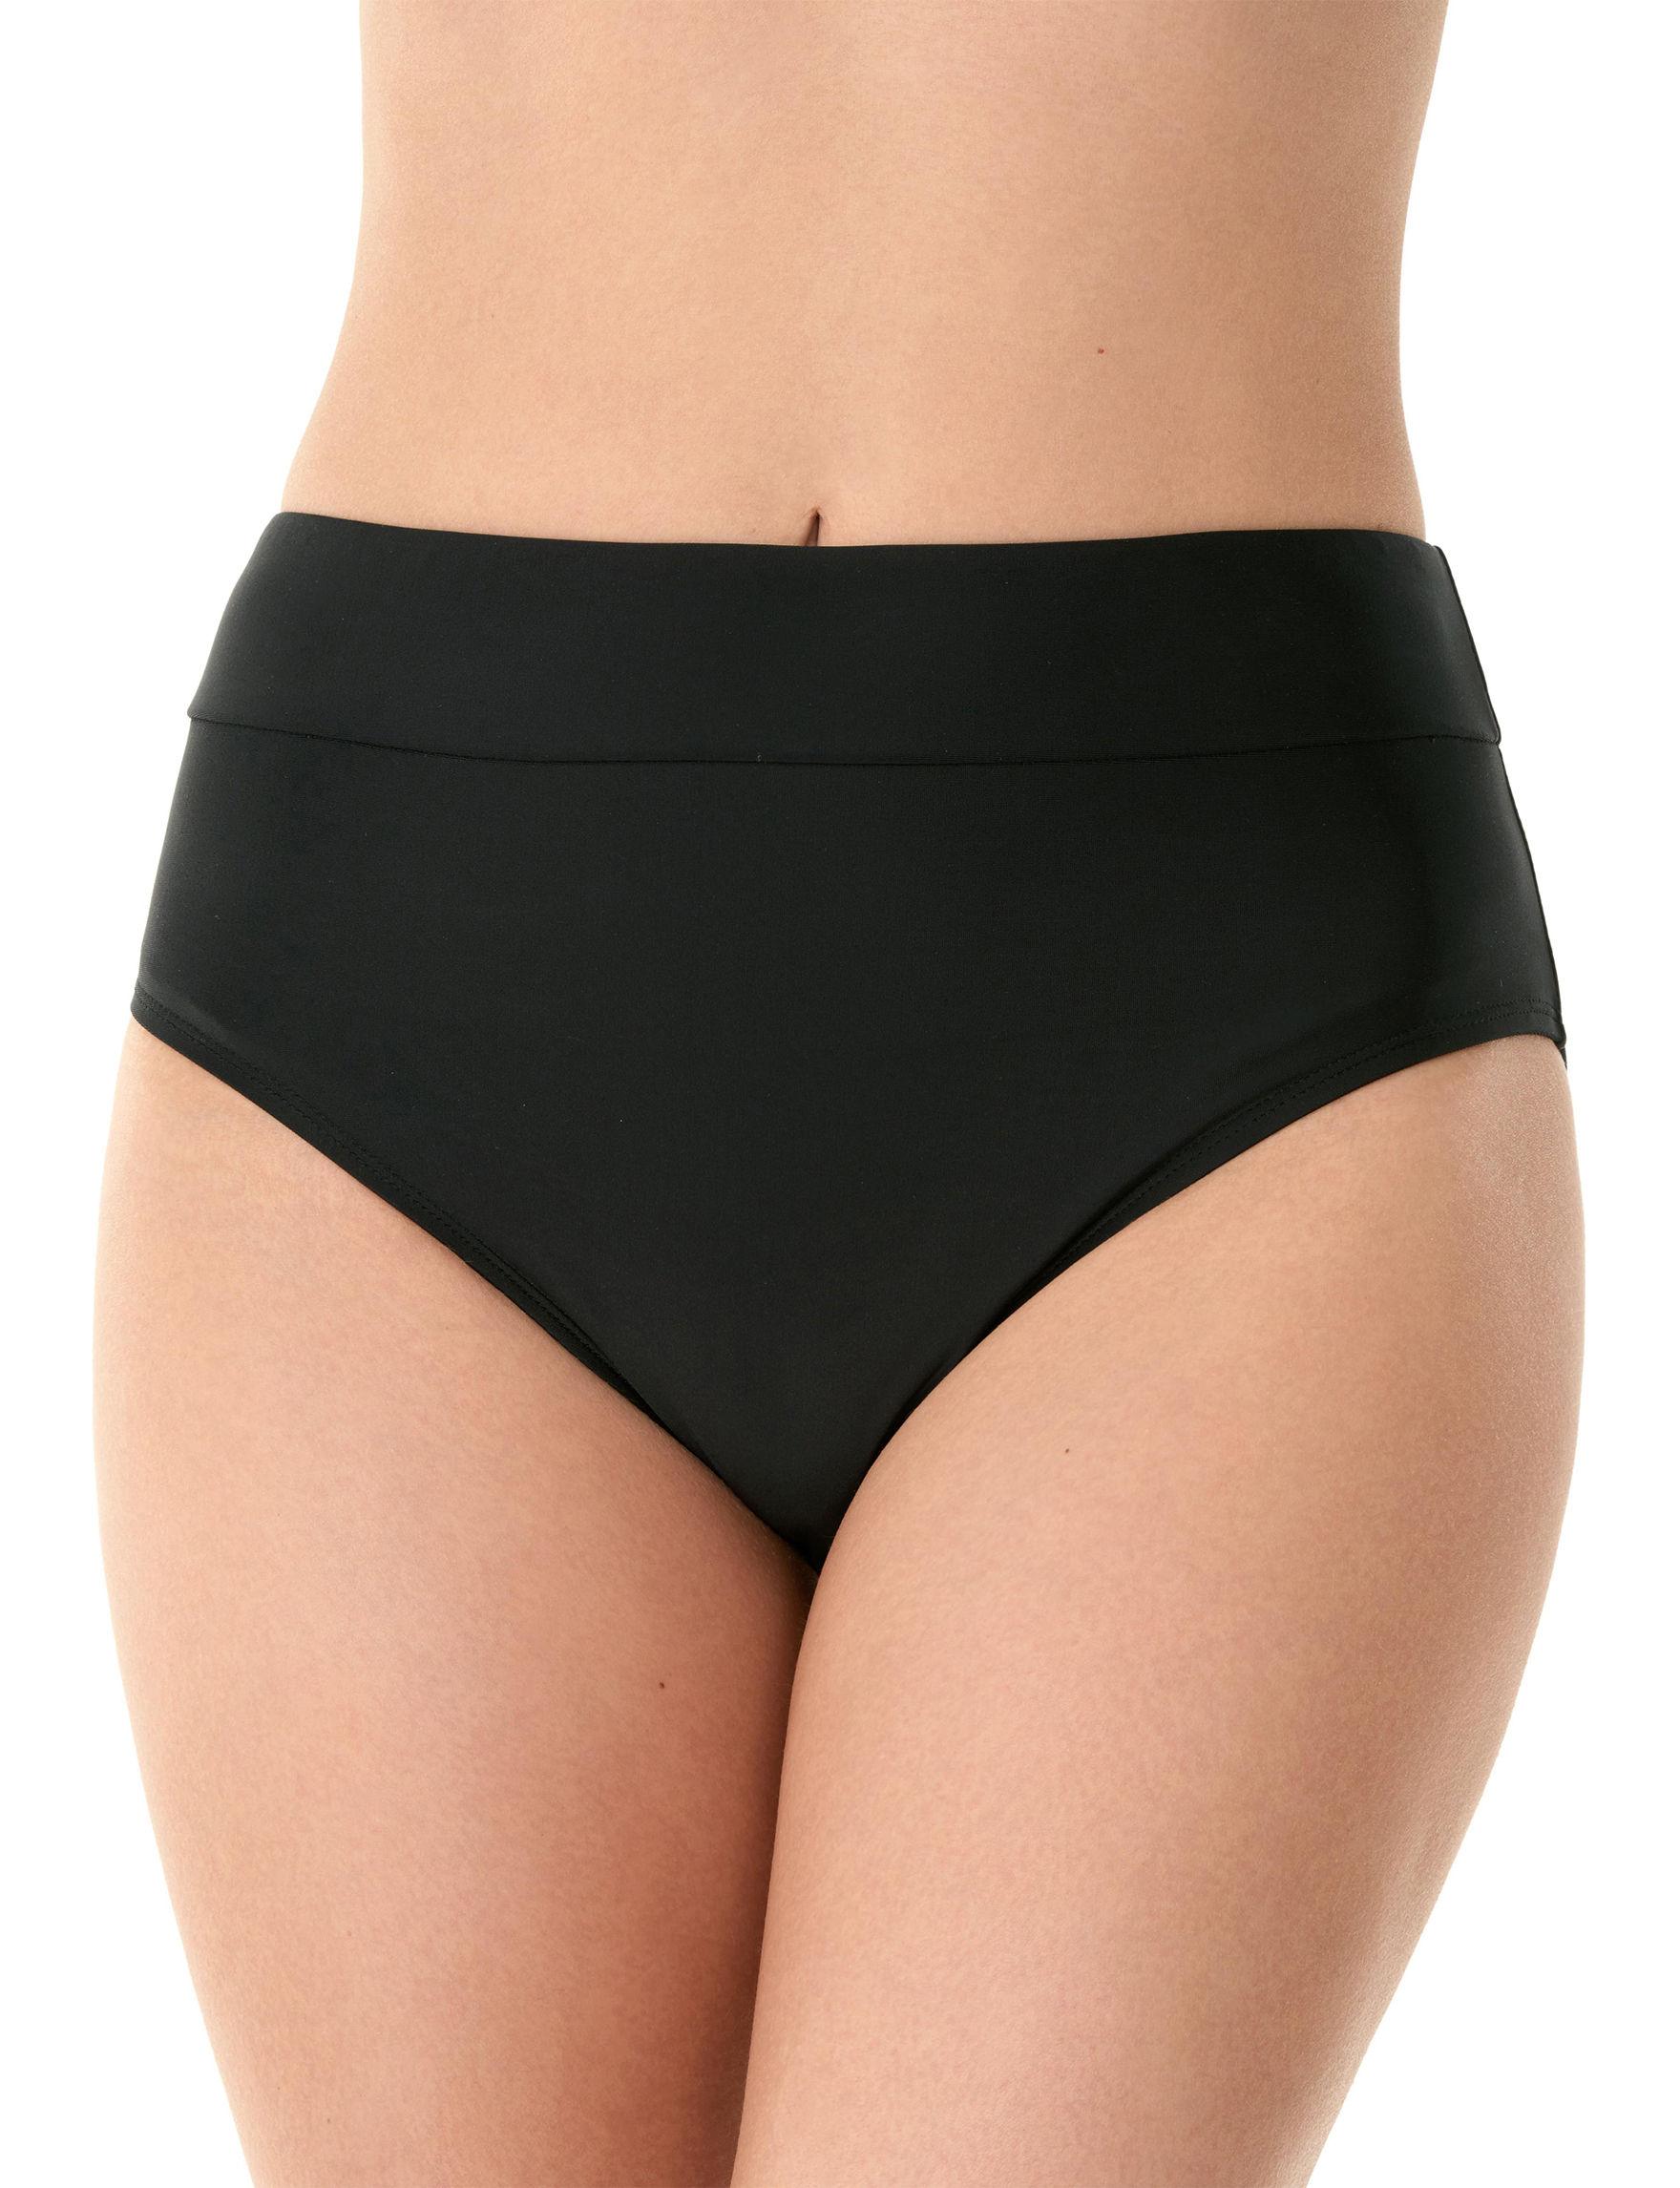 Caribbean Joe Black Swimsuit Bottoms Bikini High Waist